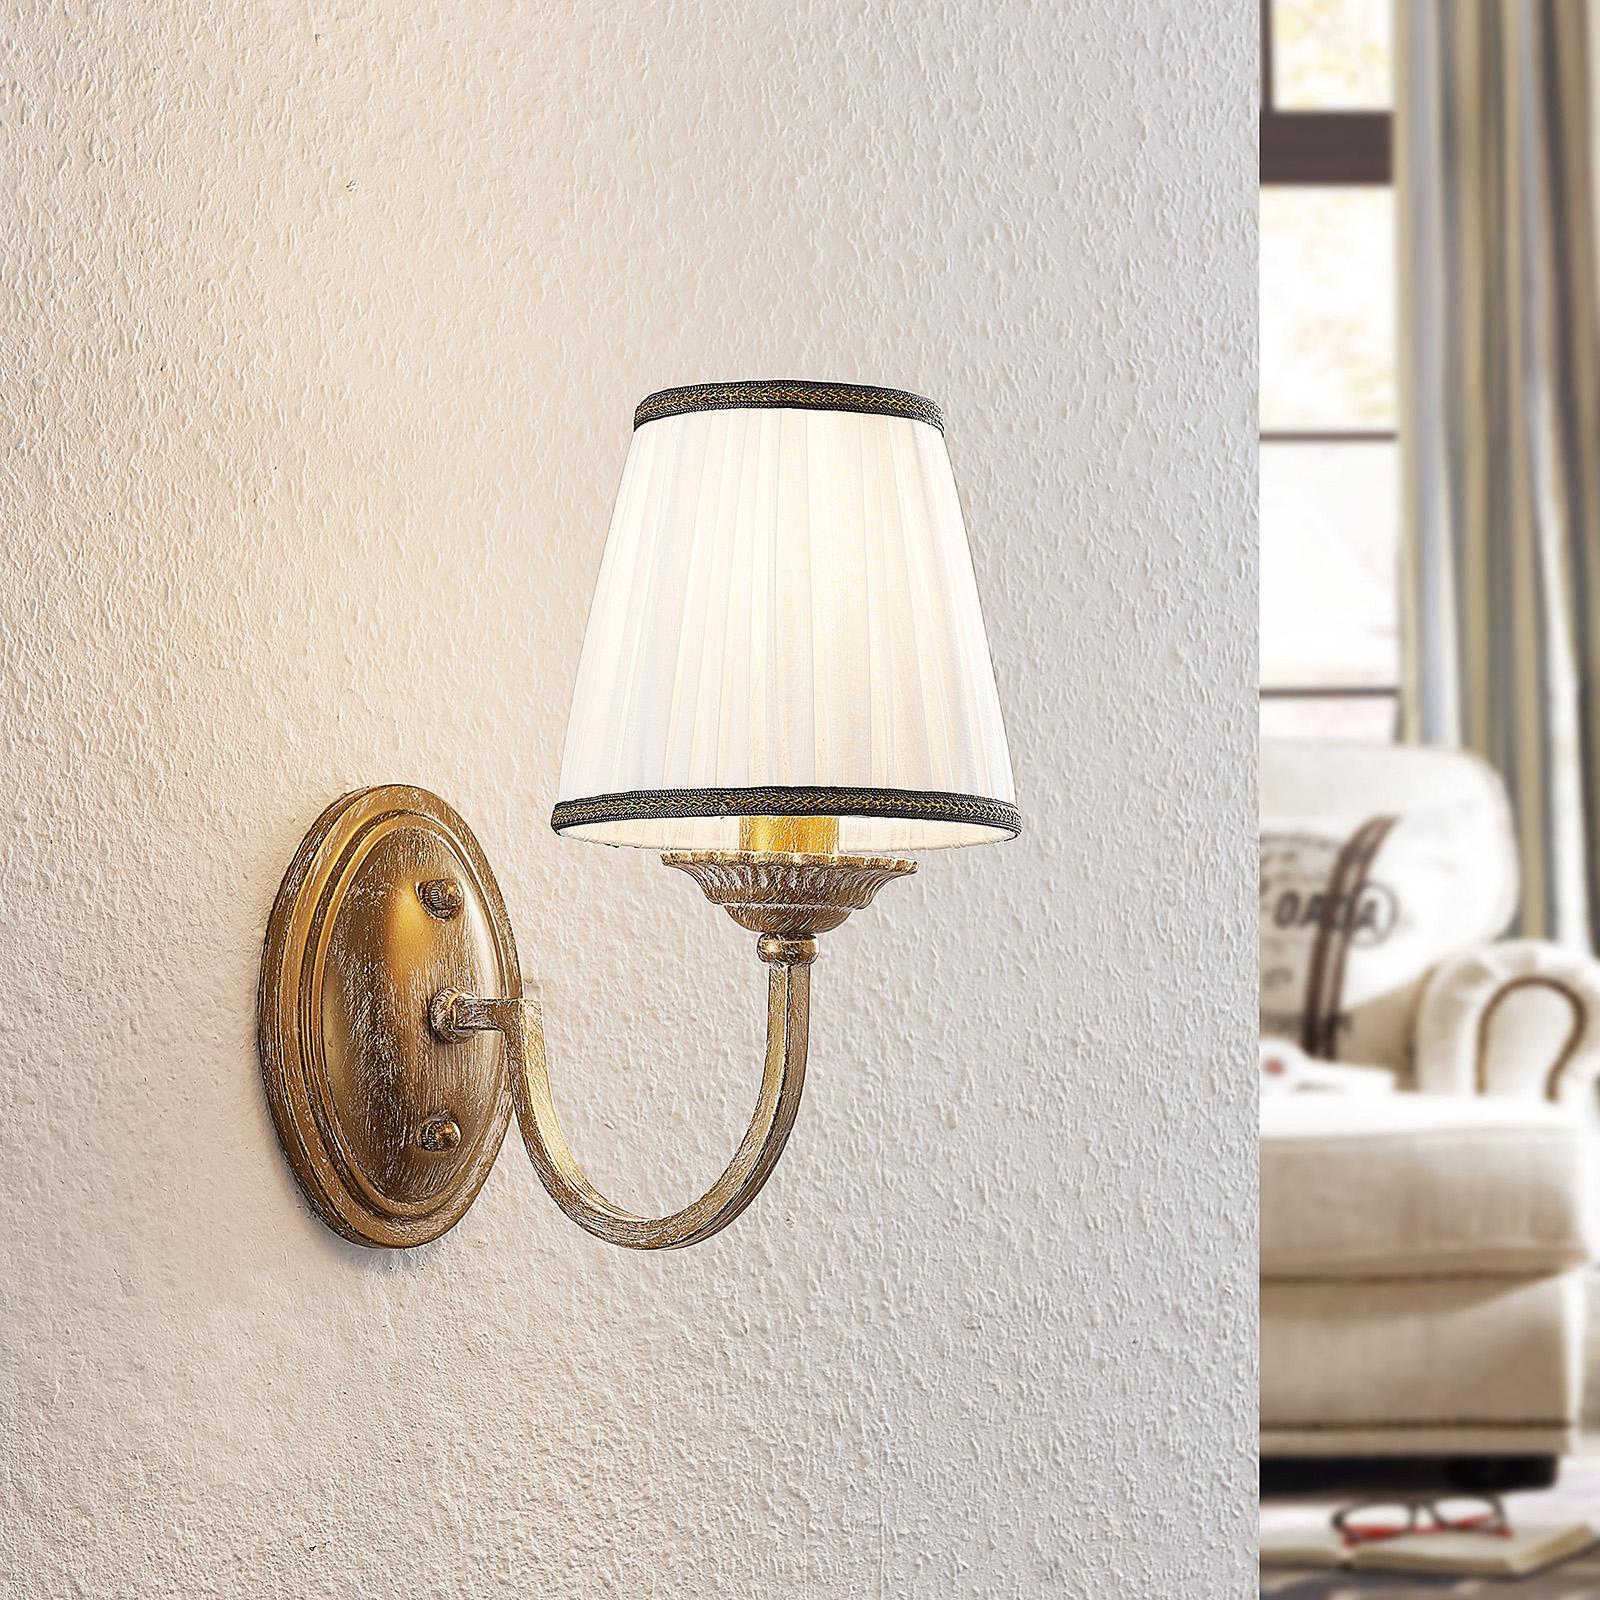 Lindby Lumiel wandlamp met stoffen kap